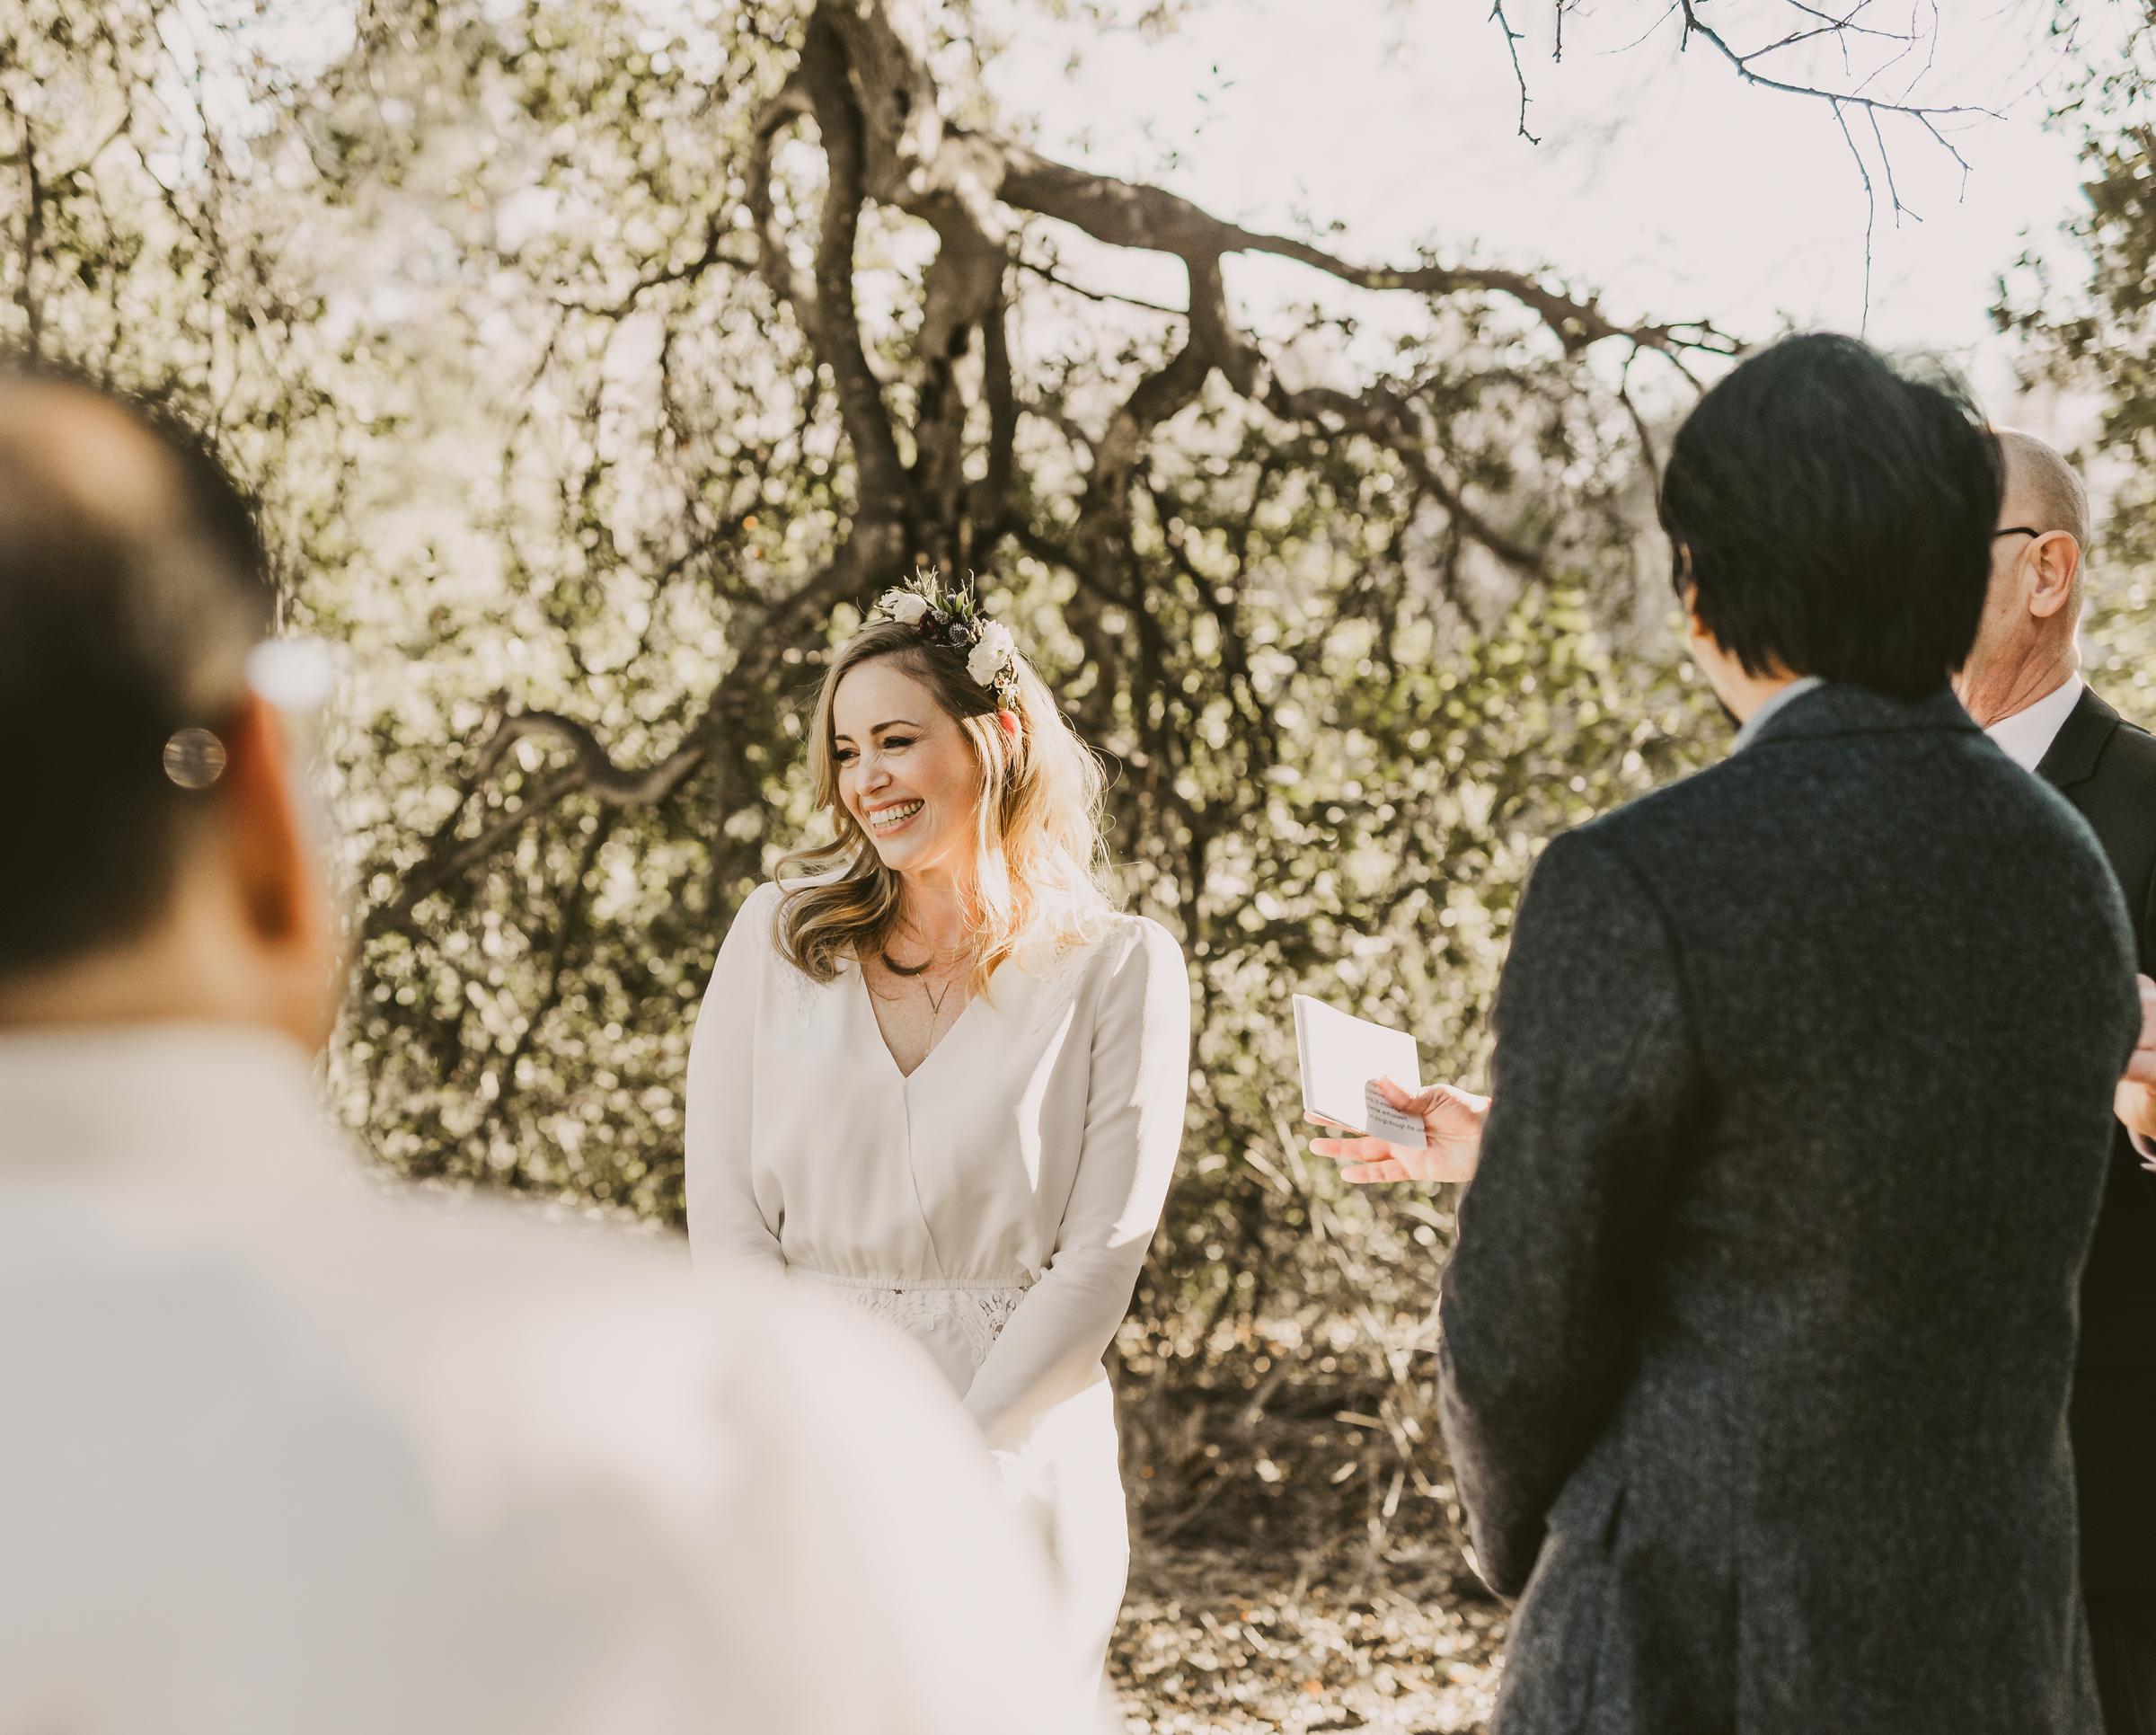 ©Isaiah + Taylor Photography - Intimate Elopement, Eaton Canyon, Los Angeles Wedding Photographer-35.jpg